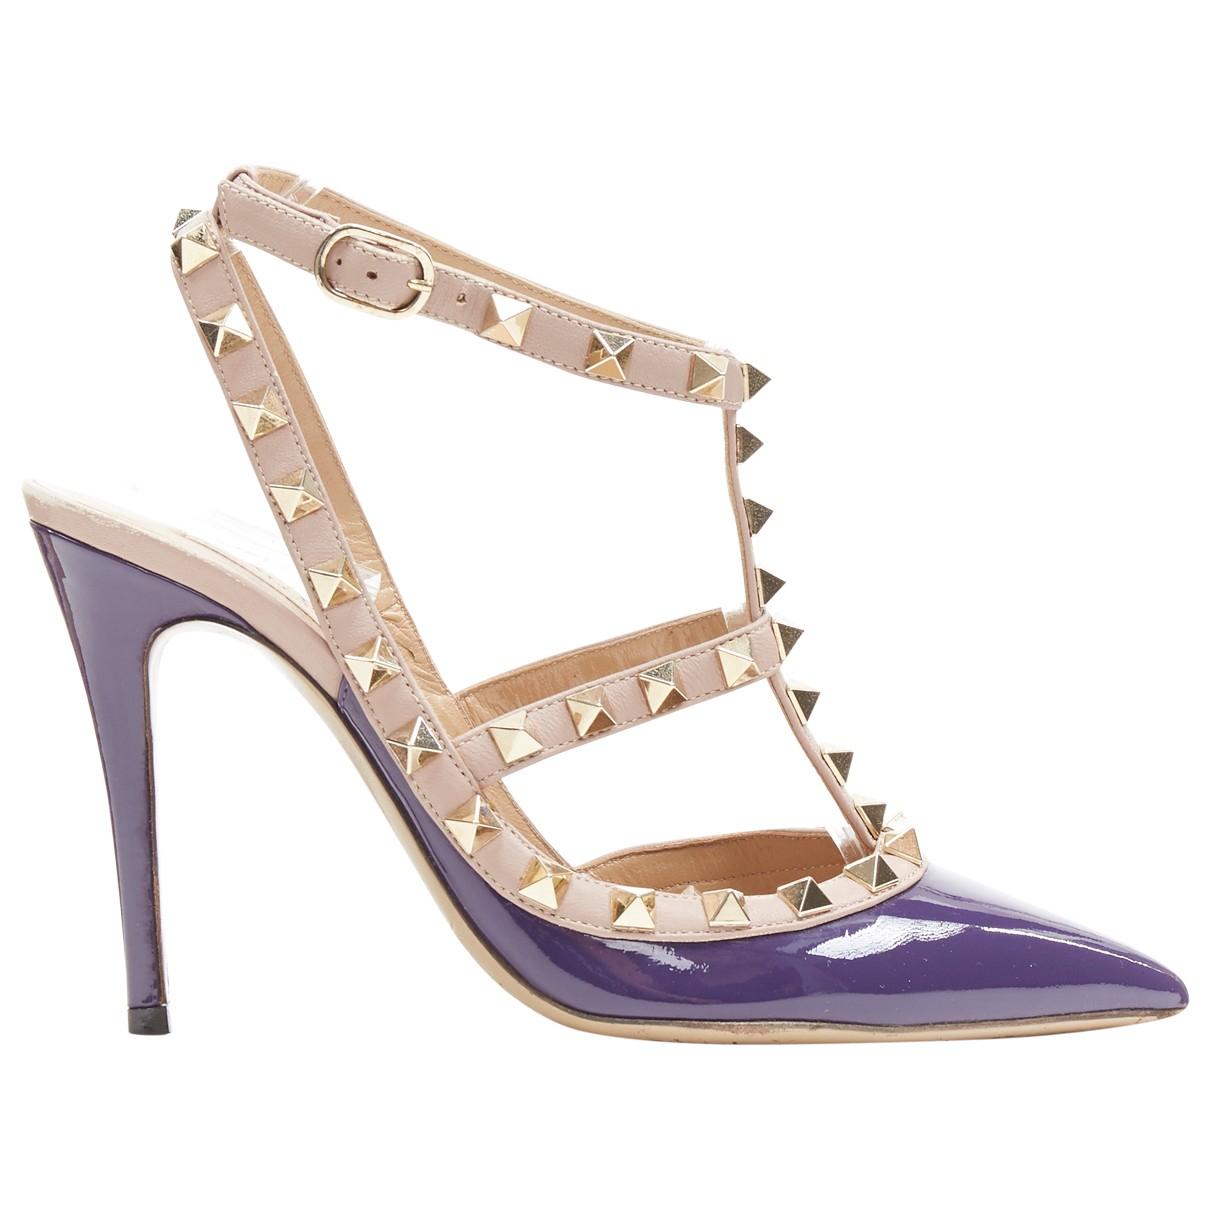 Valentino Garavani Rockstud Purple Patent leather Heels for Women 35.5 EU